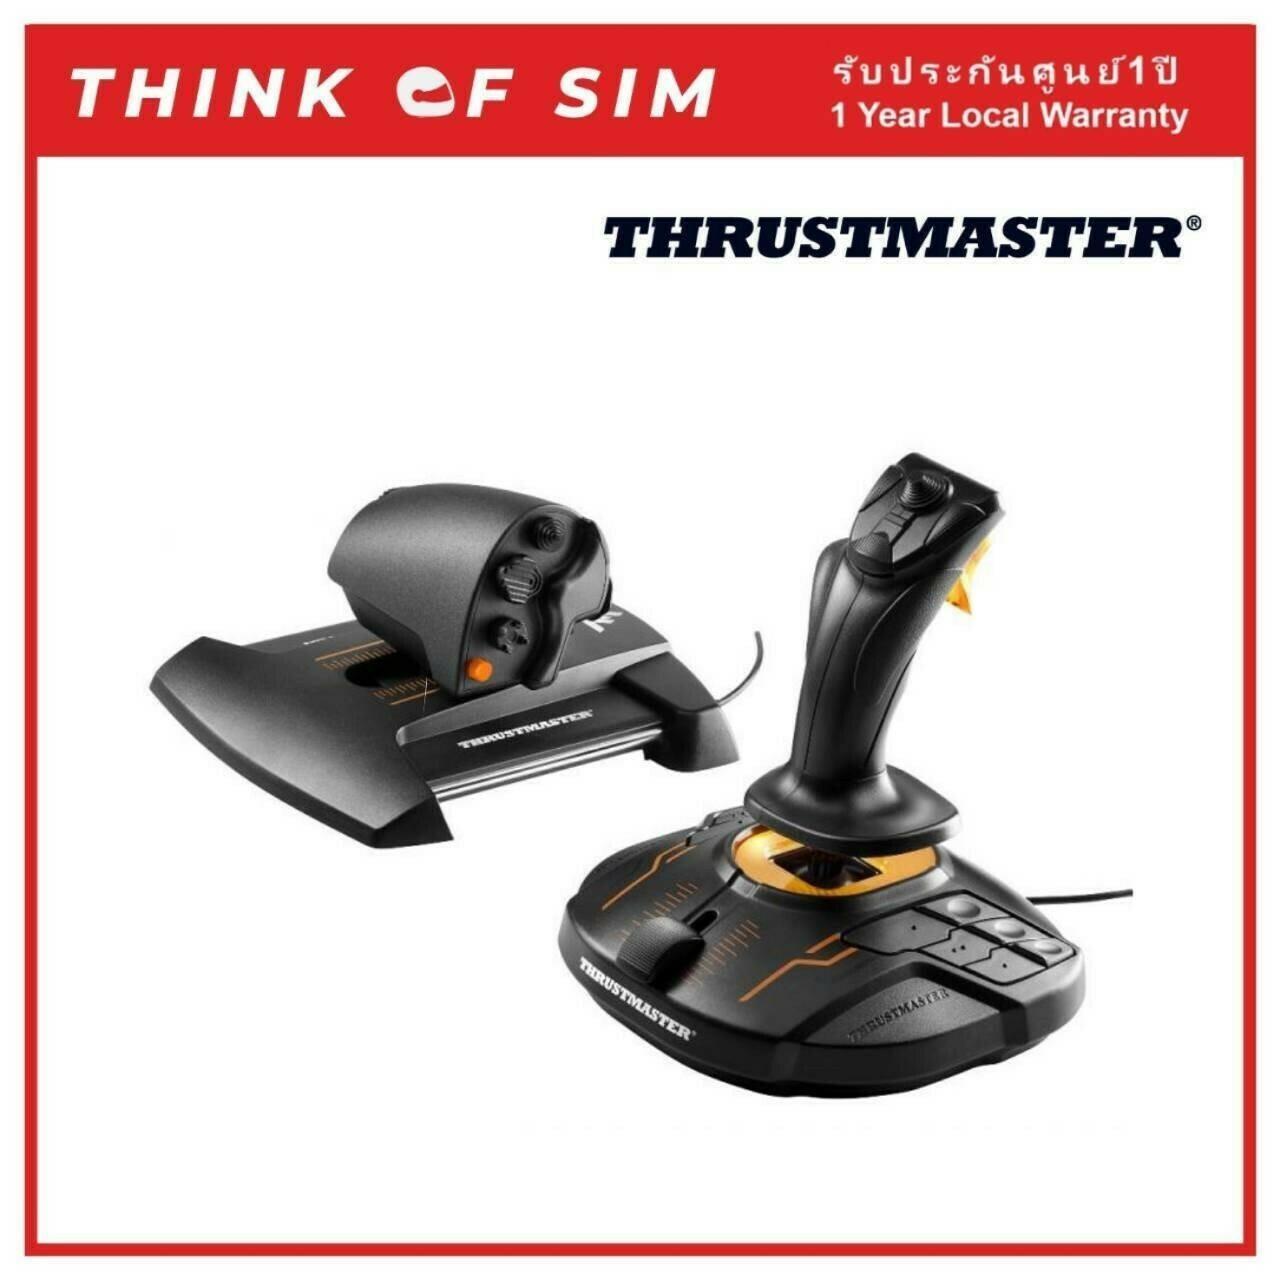 Thrustmaster T.16000M FCS HOTAS Flight Stick Flight Controller